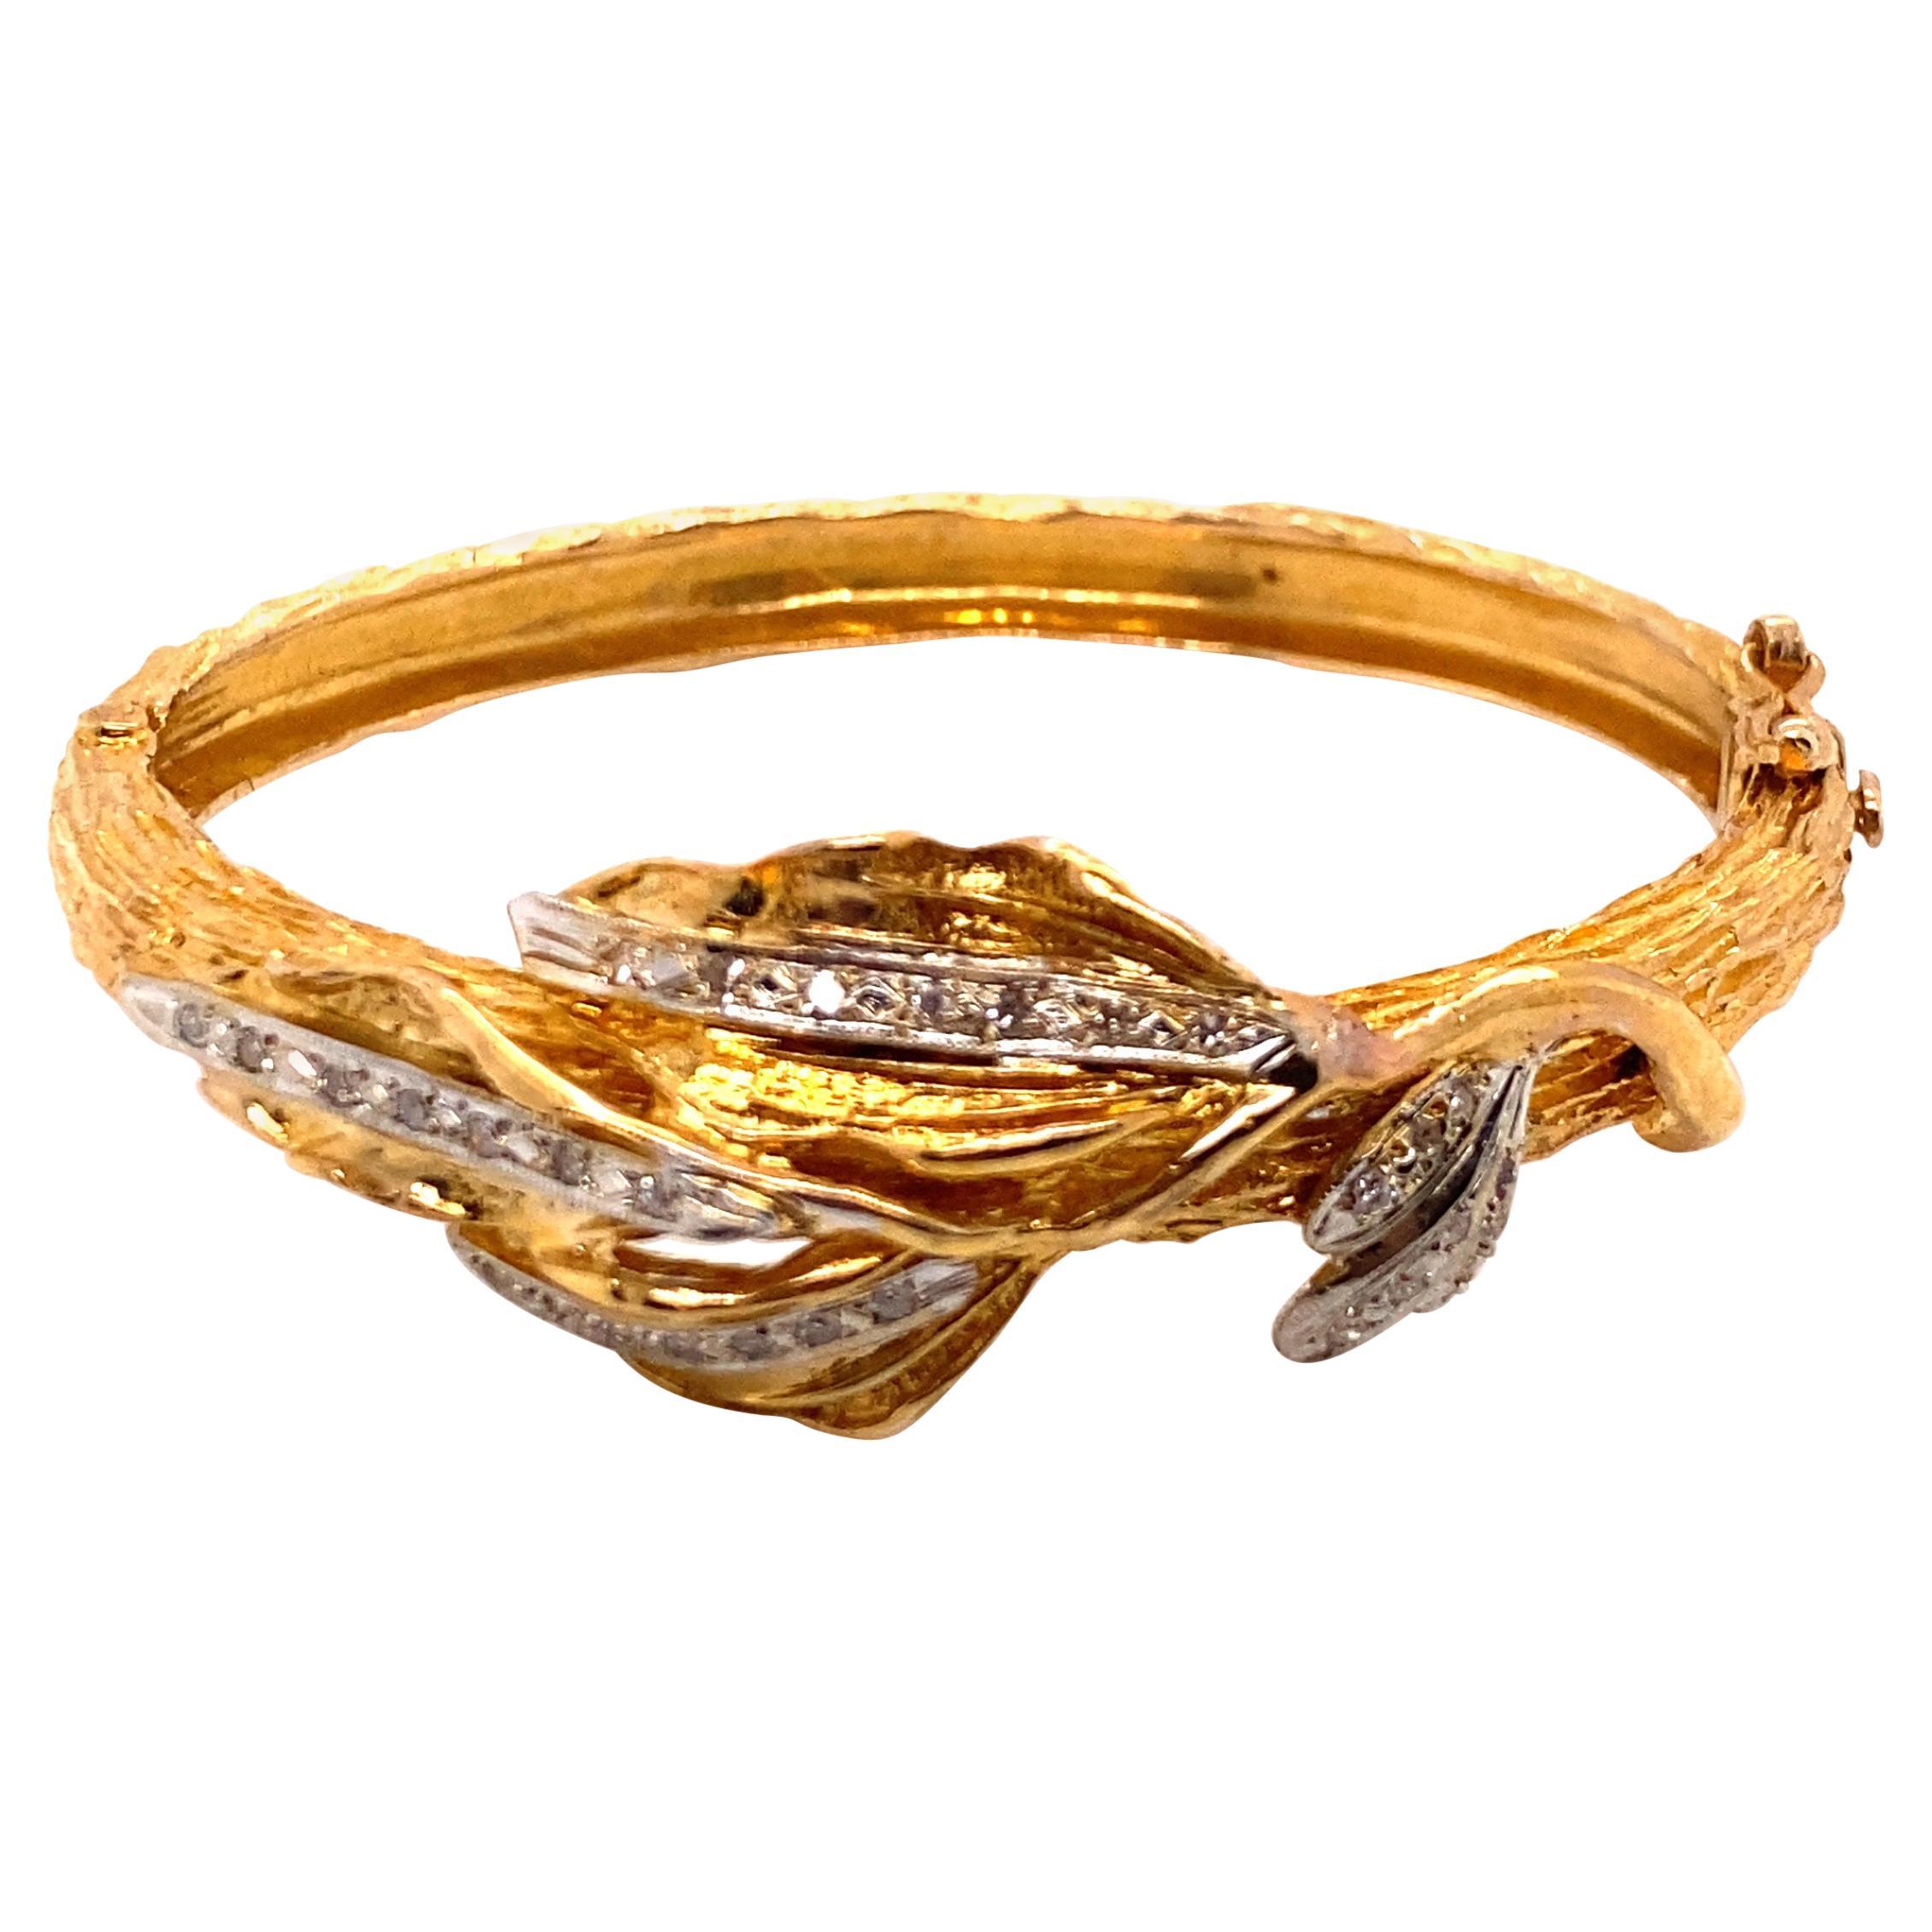 Vintage 18k Yellow Gold Diamond Leaf Bangle